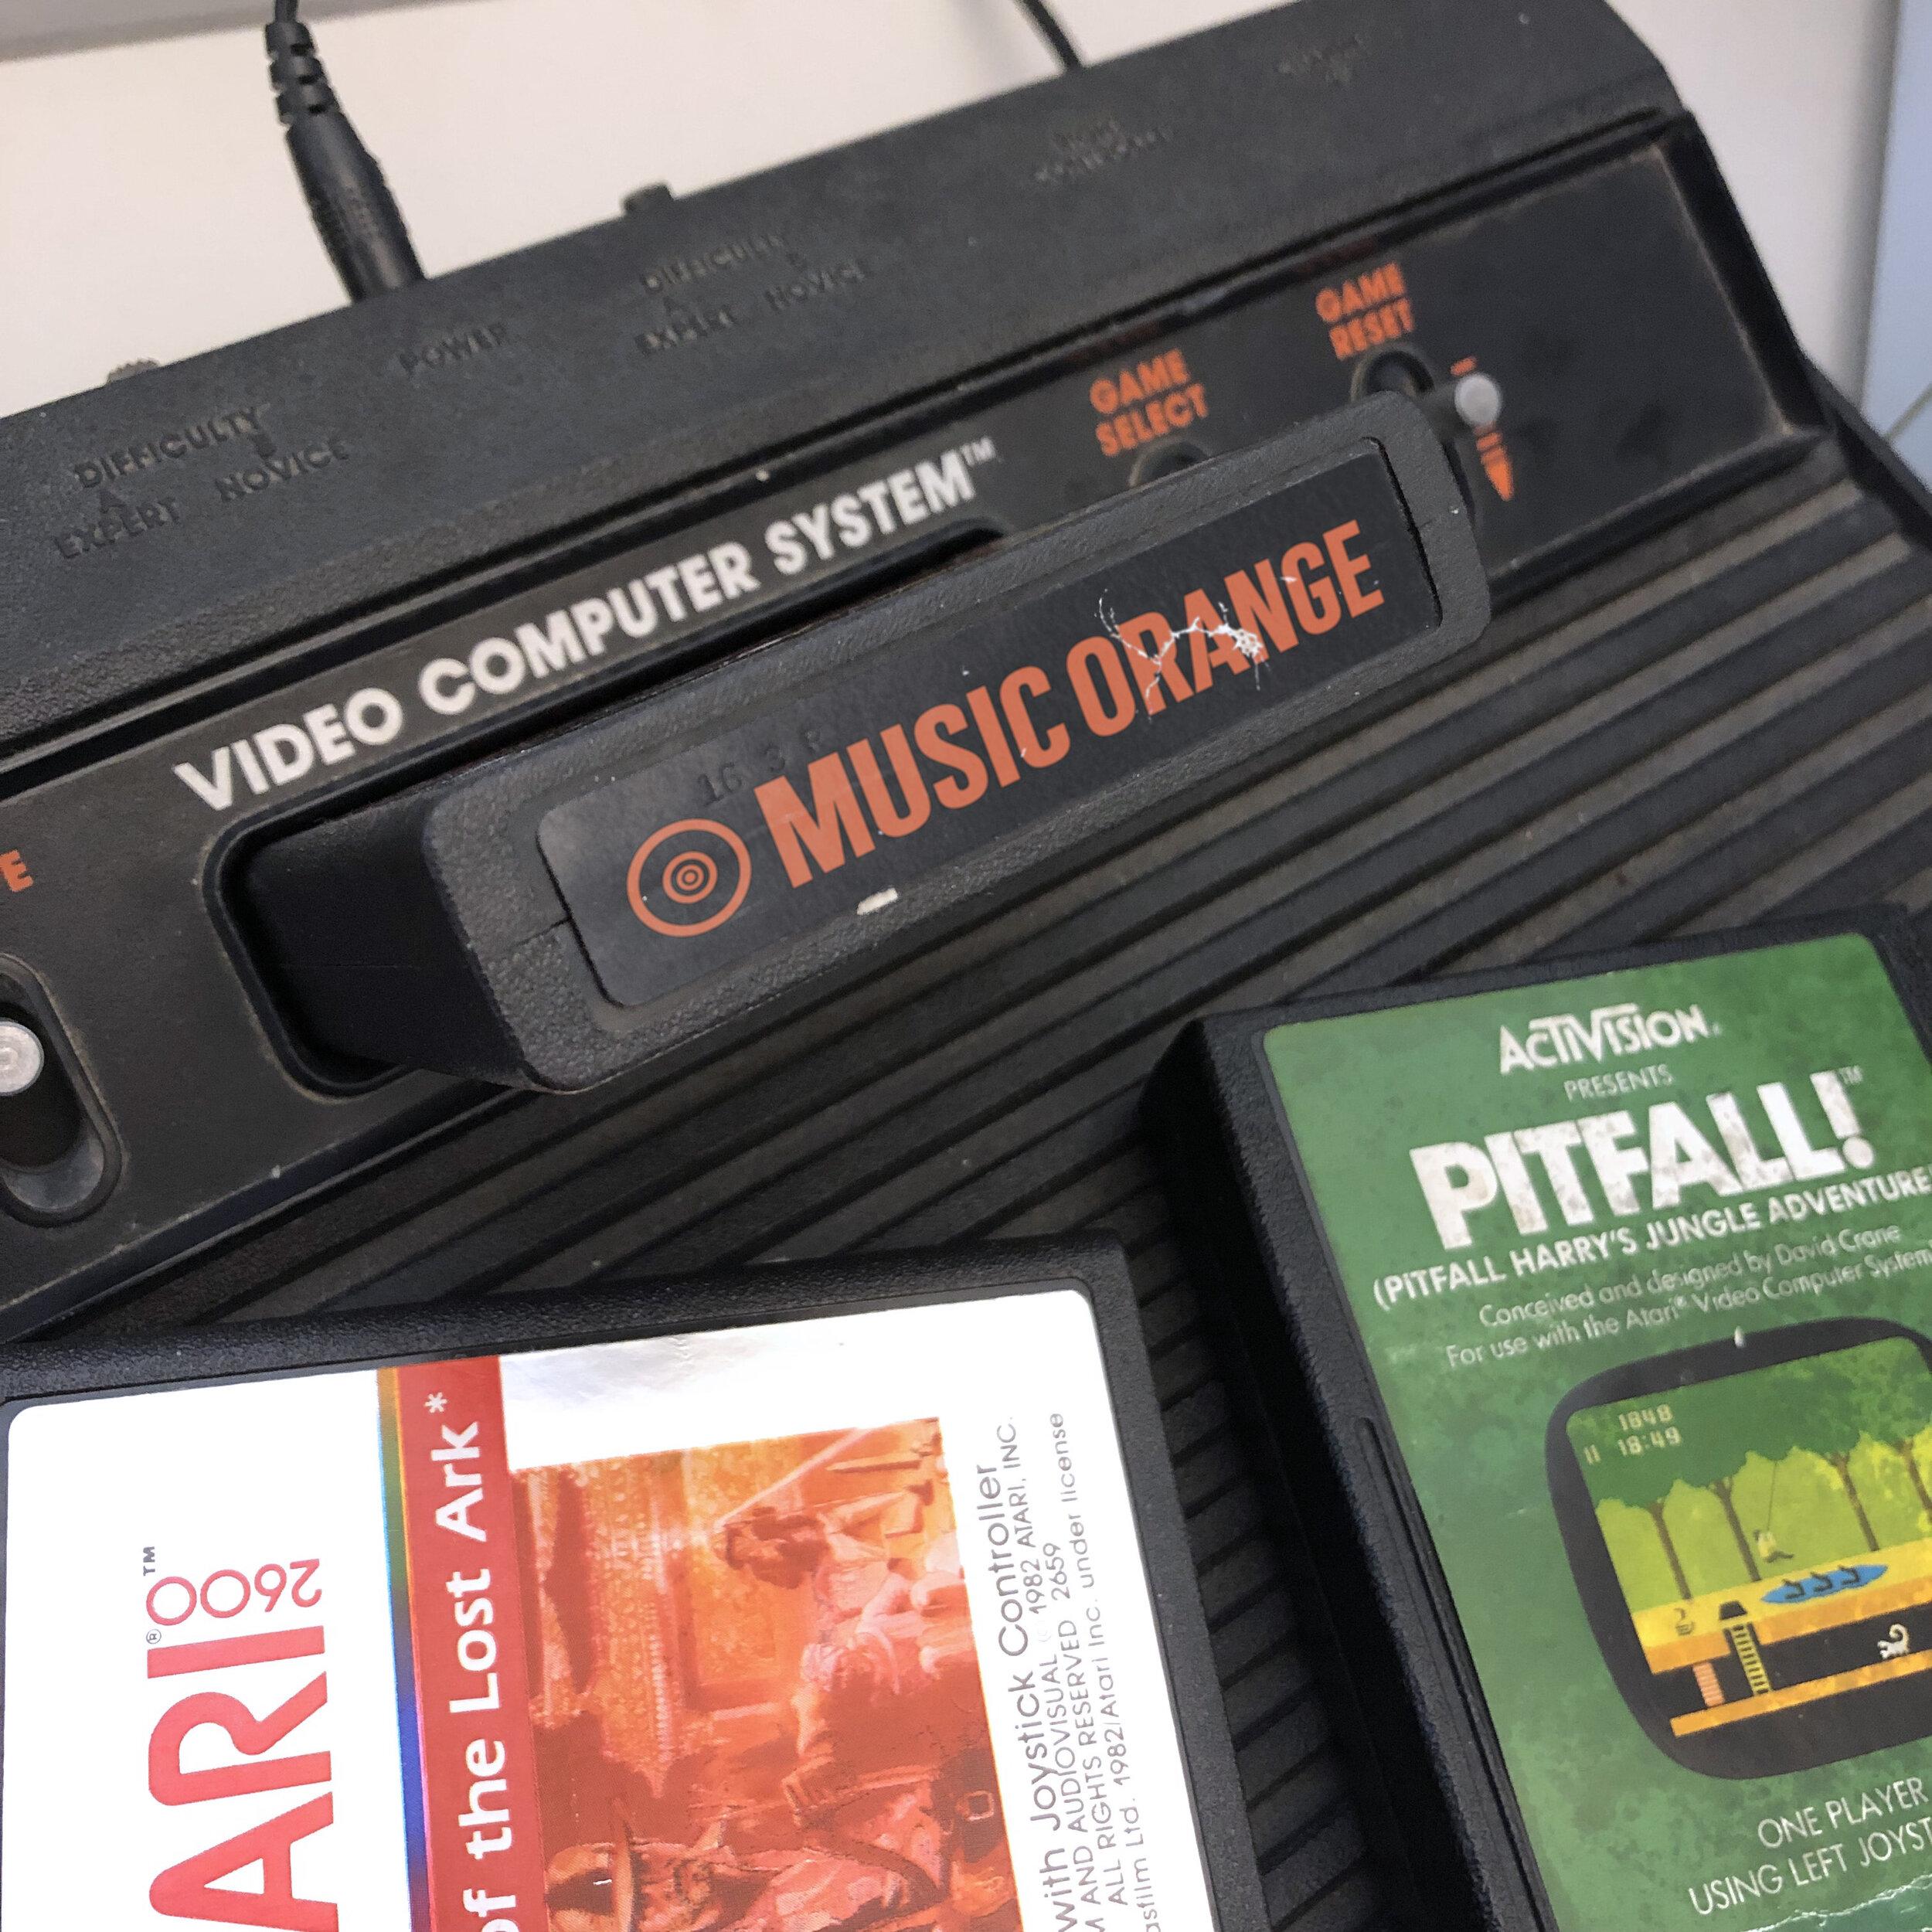 music-orange-atari.jpg